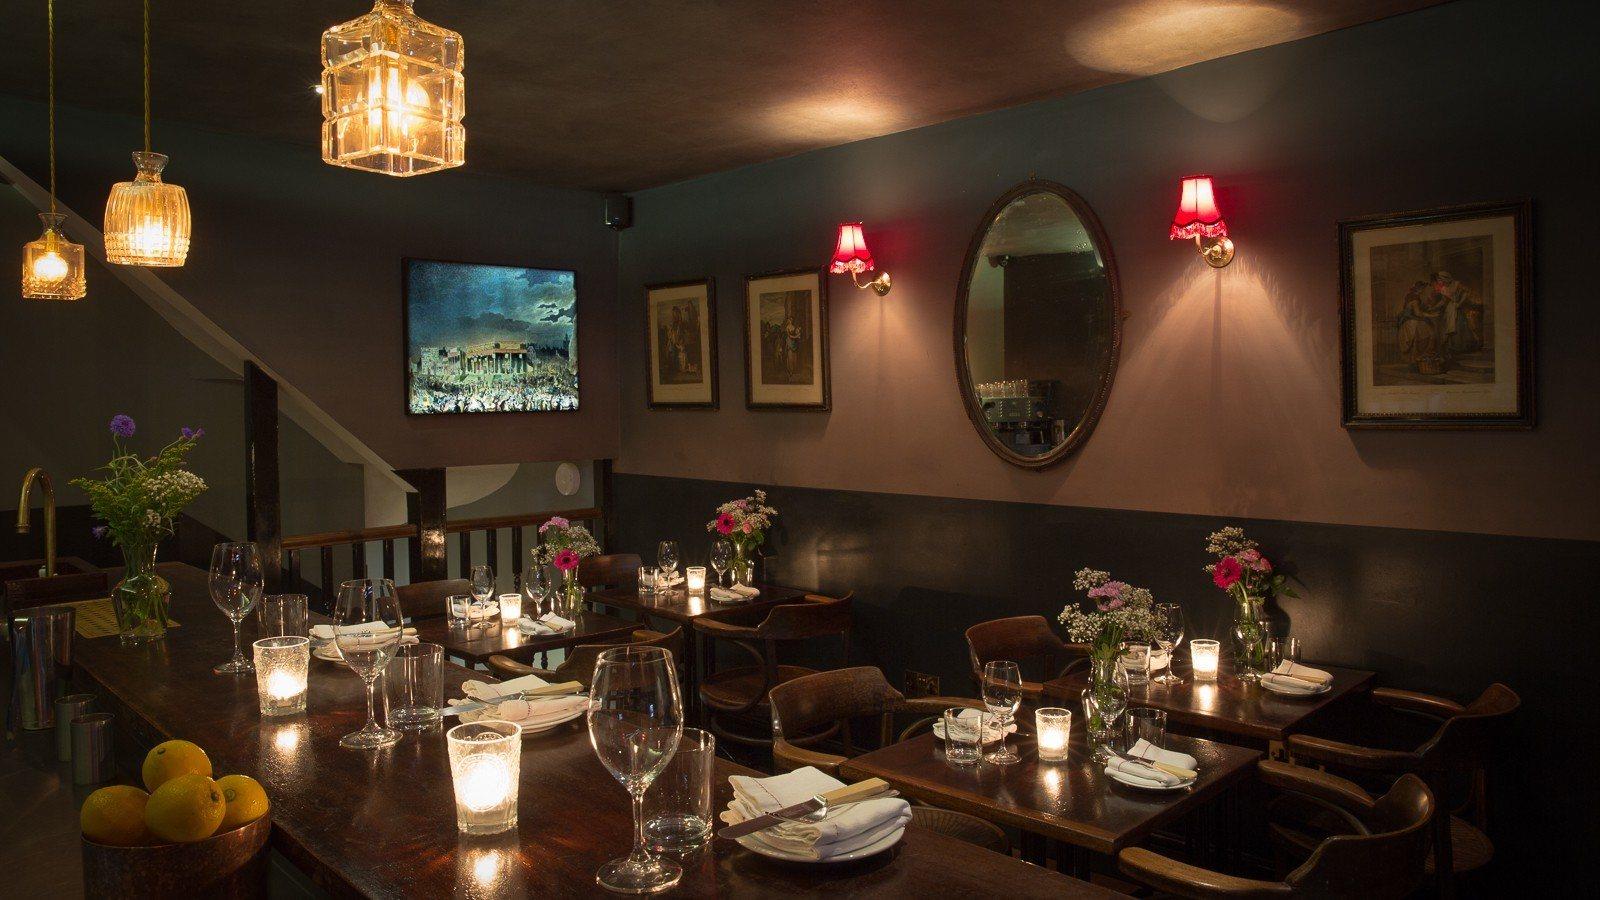 11 romantic restaurants for date night in london 11 Romantic Restaurants for Date Night in London RRRKviWLbSmud H6xN5lzYHFD1Z16UW5UlL0Xz2aITOlrfDFpdelTmY3bn6SZ1tCWTL isJFVPGHIYD81vT0SE2iiOnOTpnUHgcxBZueNTFQBbNOC35X82zJpRLMZG7w4g